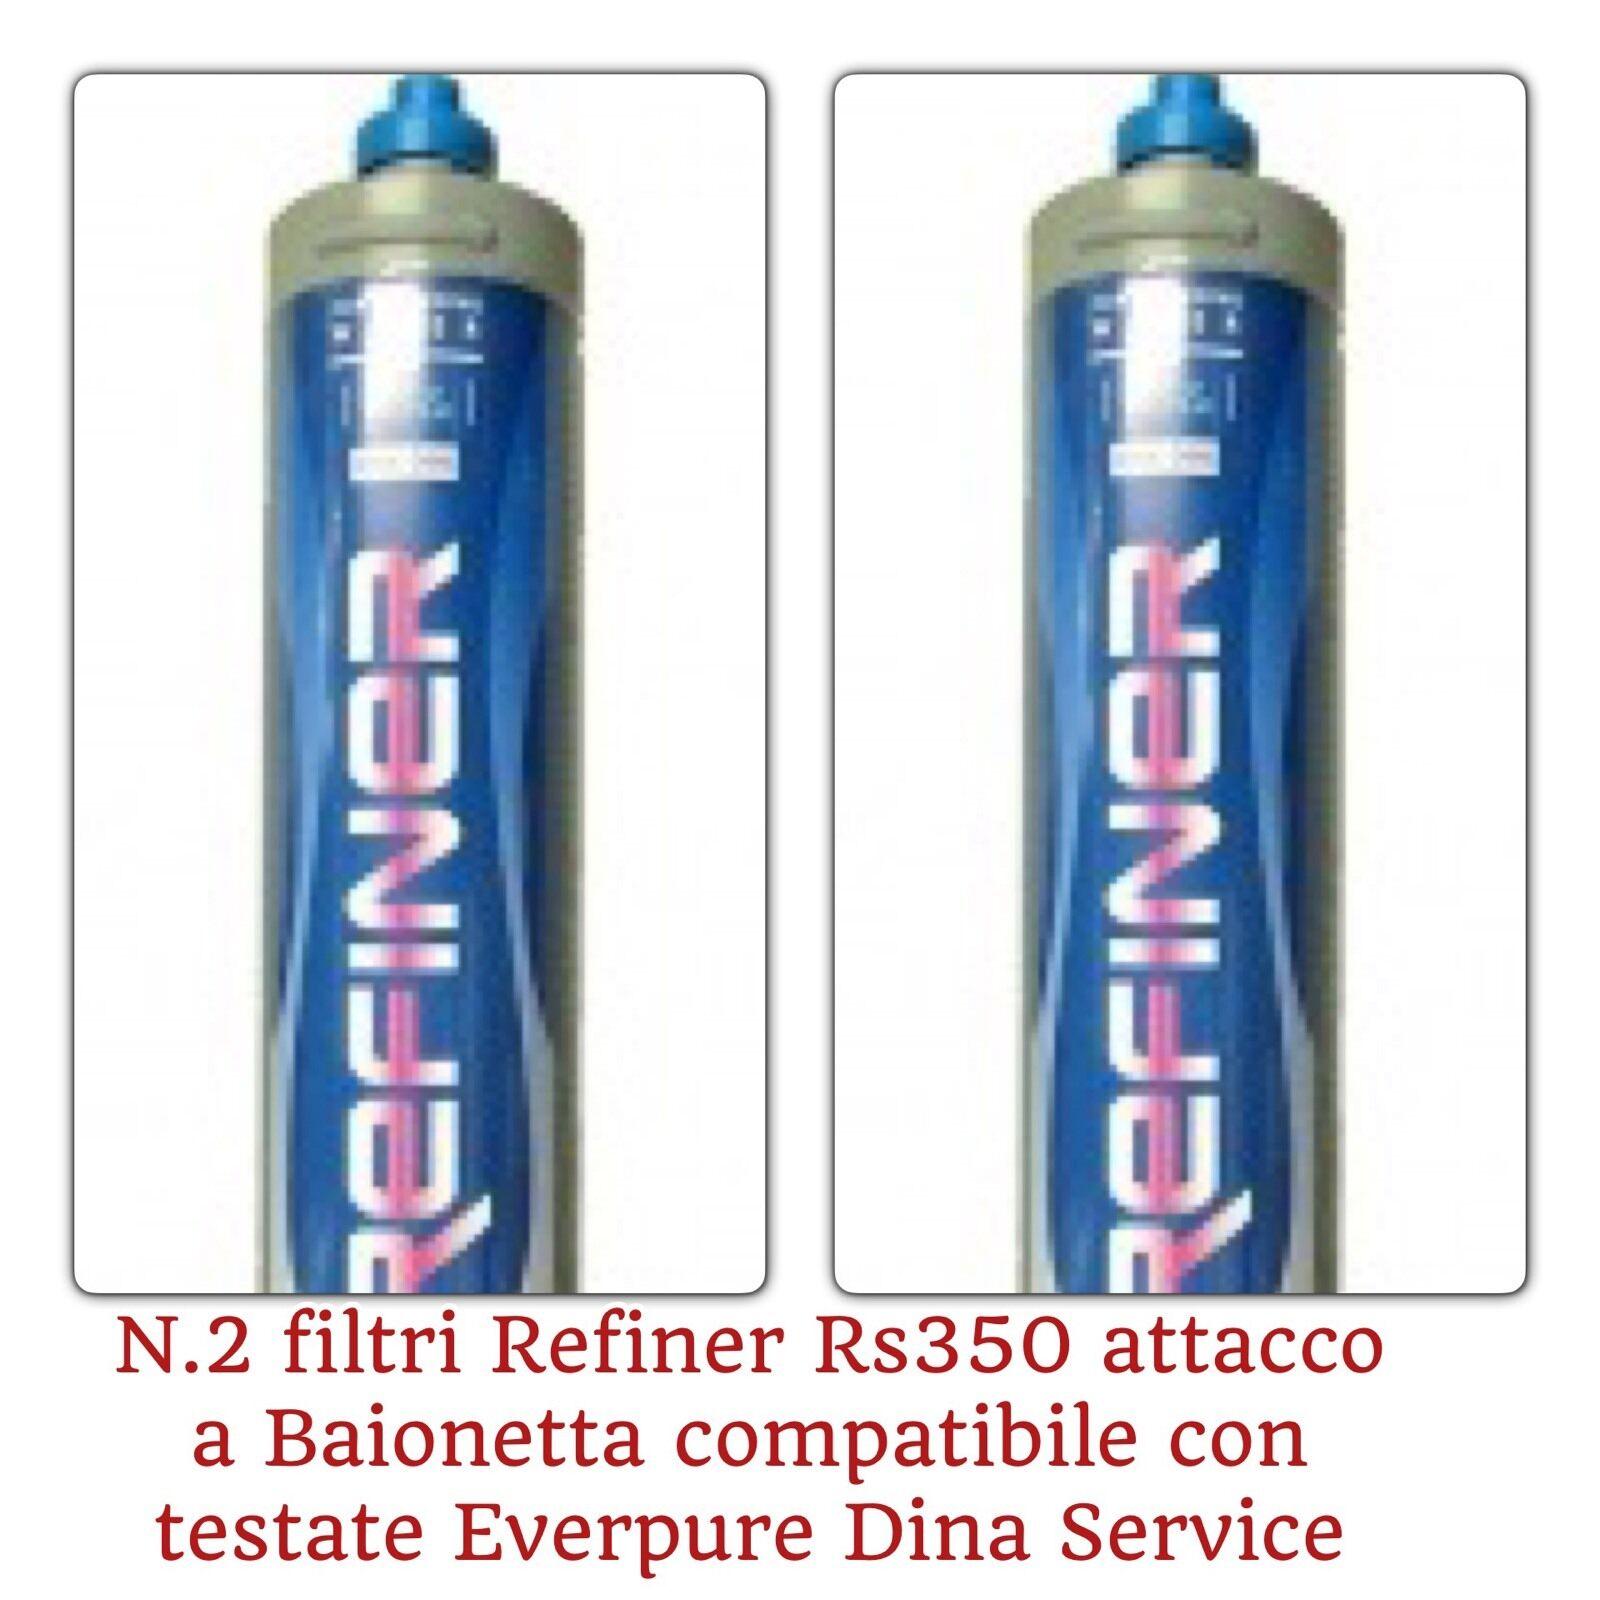 Refainer Filtro Filtri  RS350 N.2  per purificatore acqua casa bar